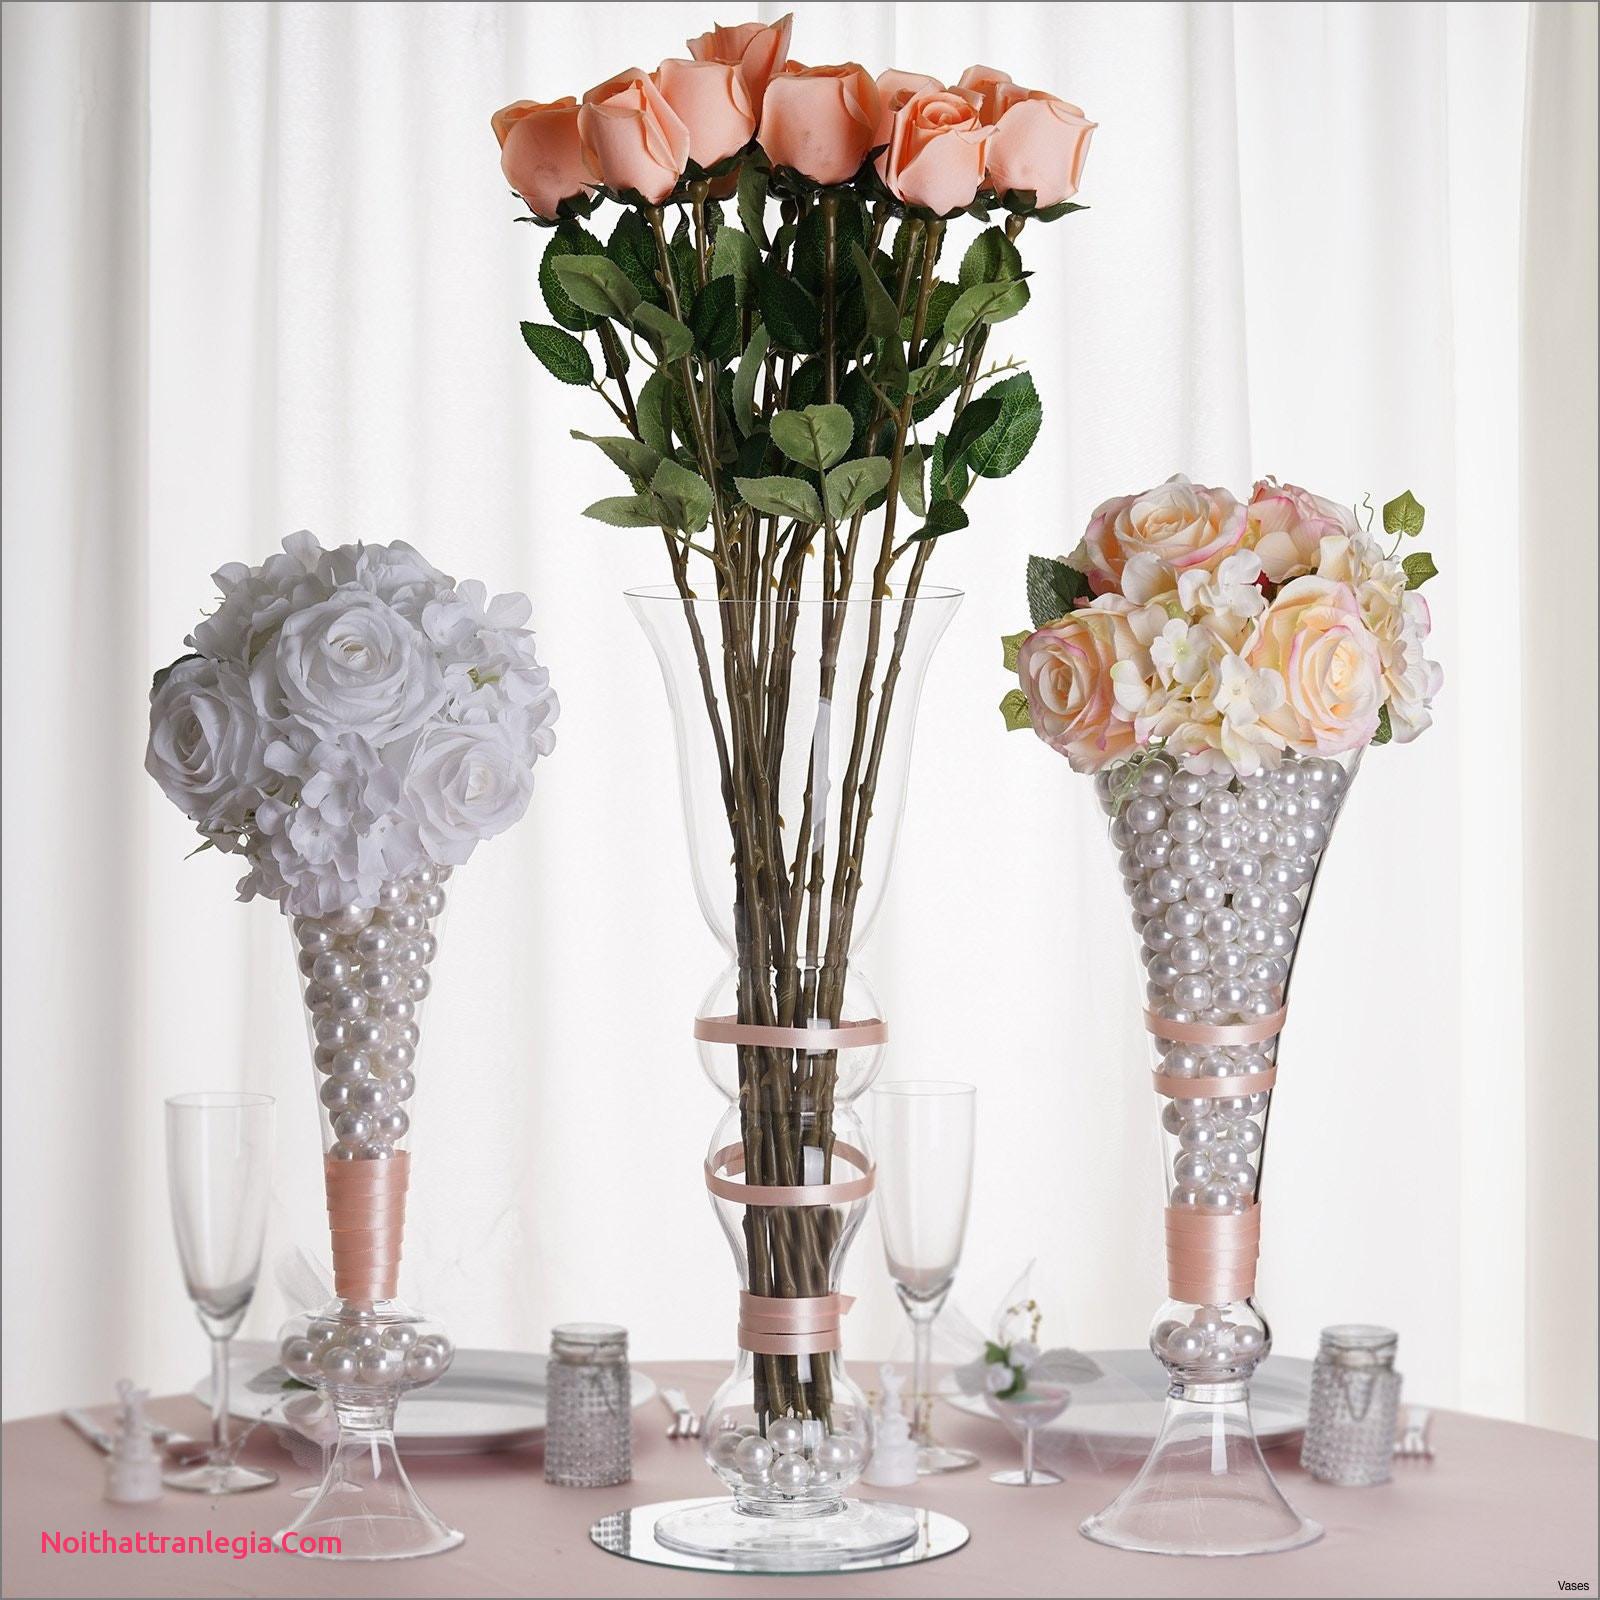 tall centerpiece vases bulk of 20 how to clean flower vases noithattranlegia vases design in update clipart awesome flower vase table 04h vases tablei 0d clipart dining base end design